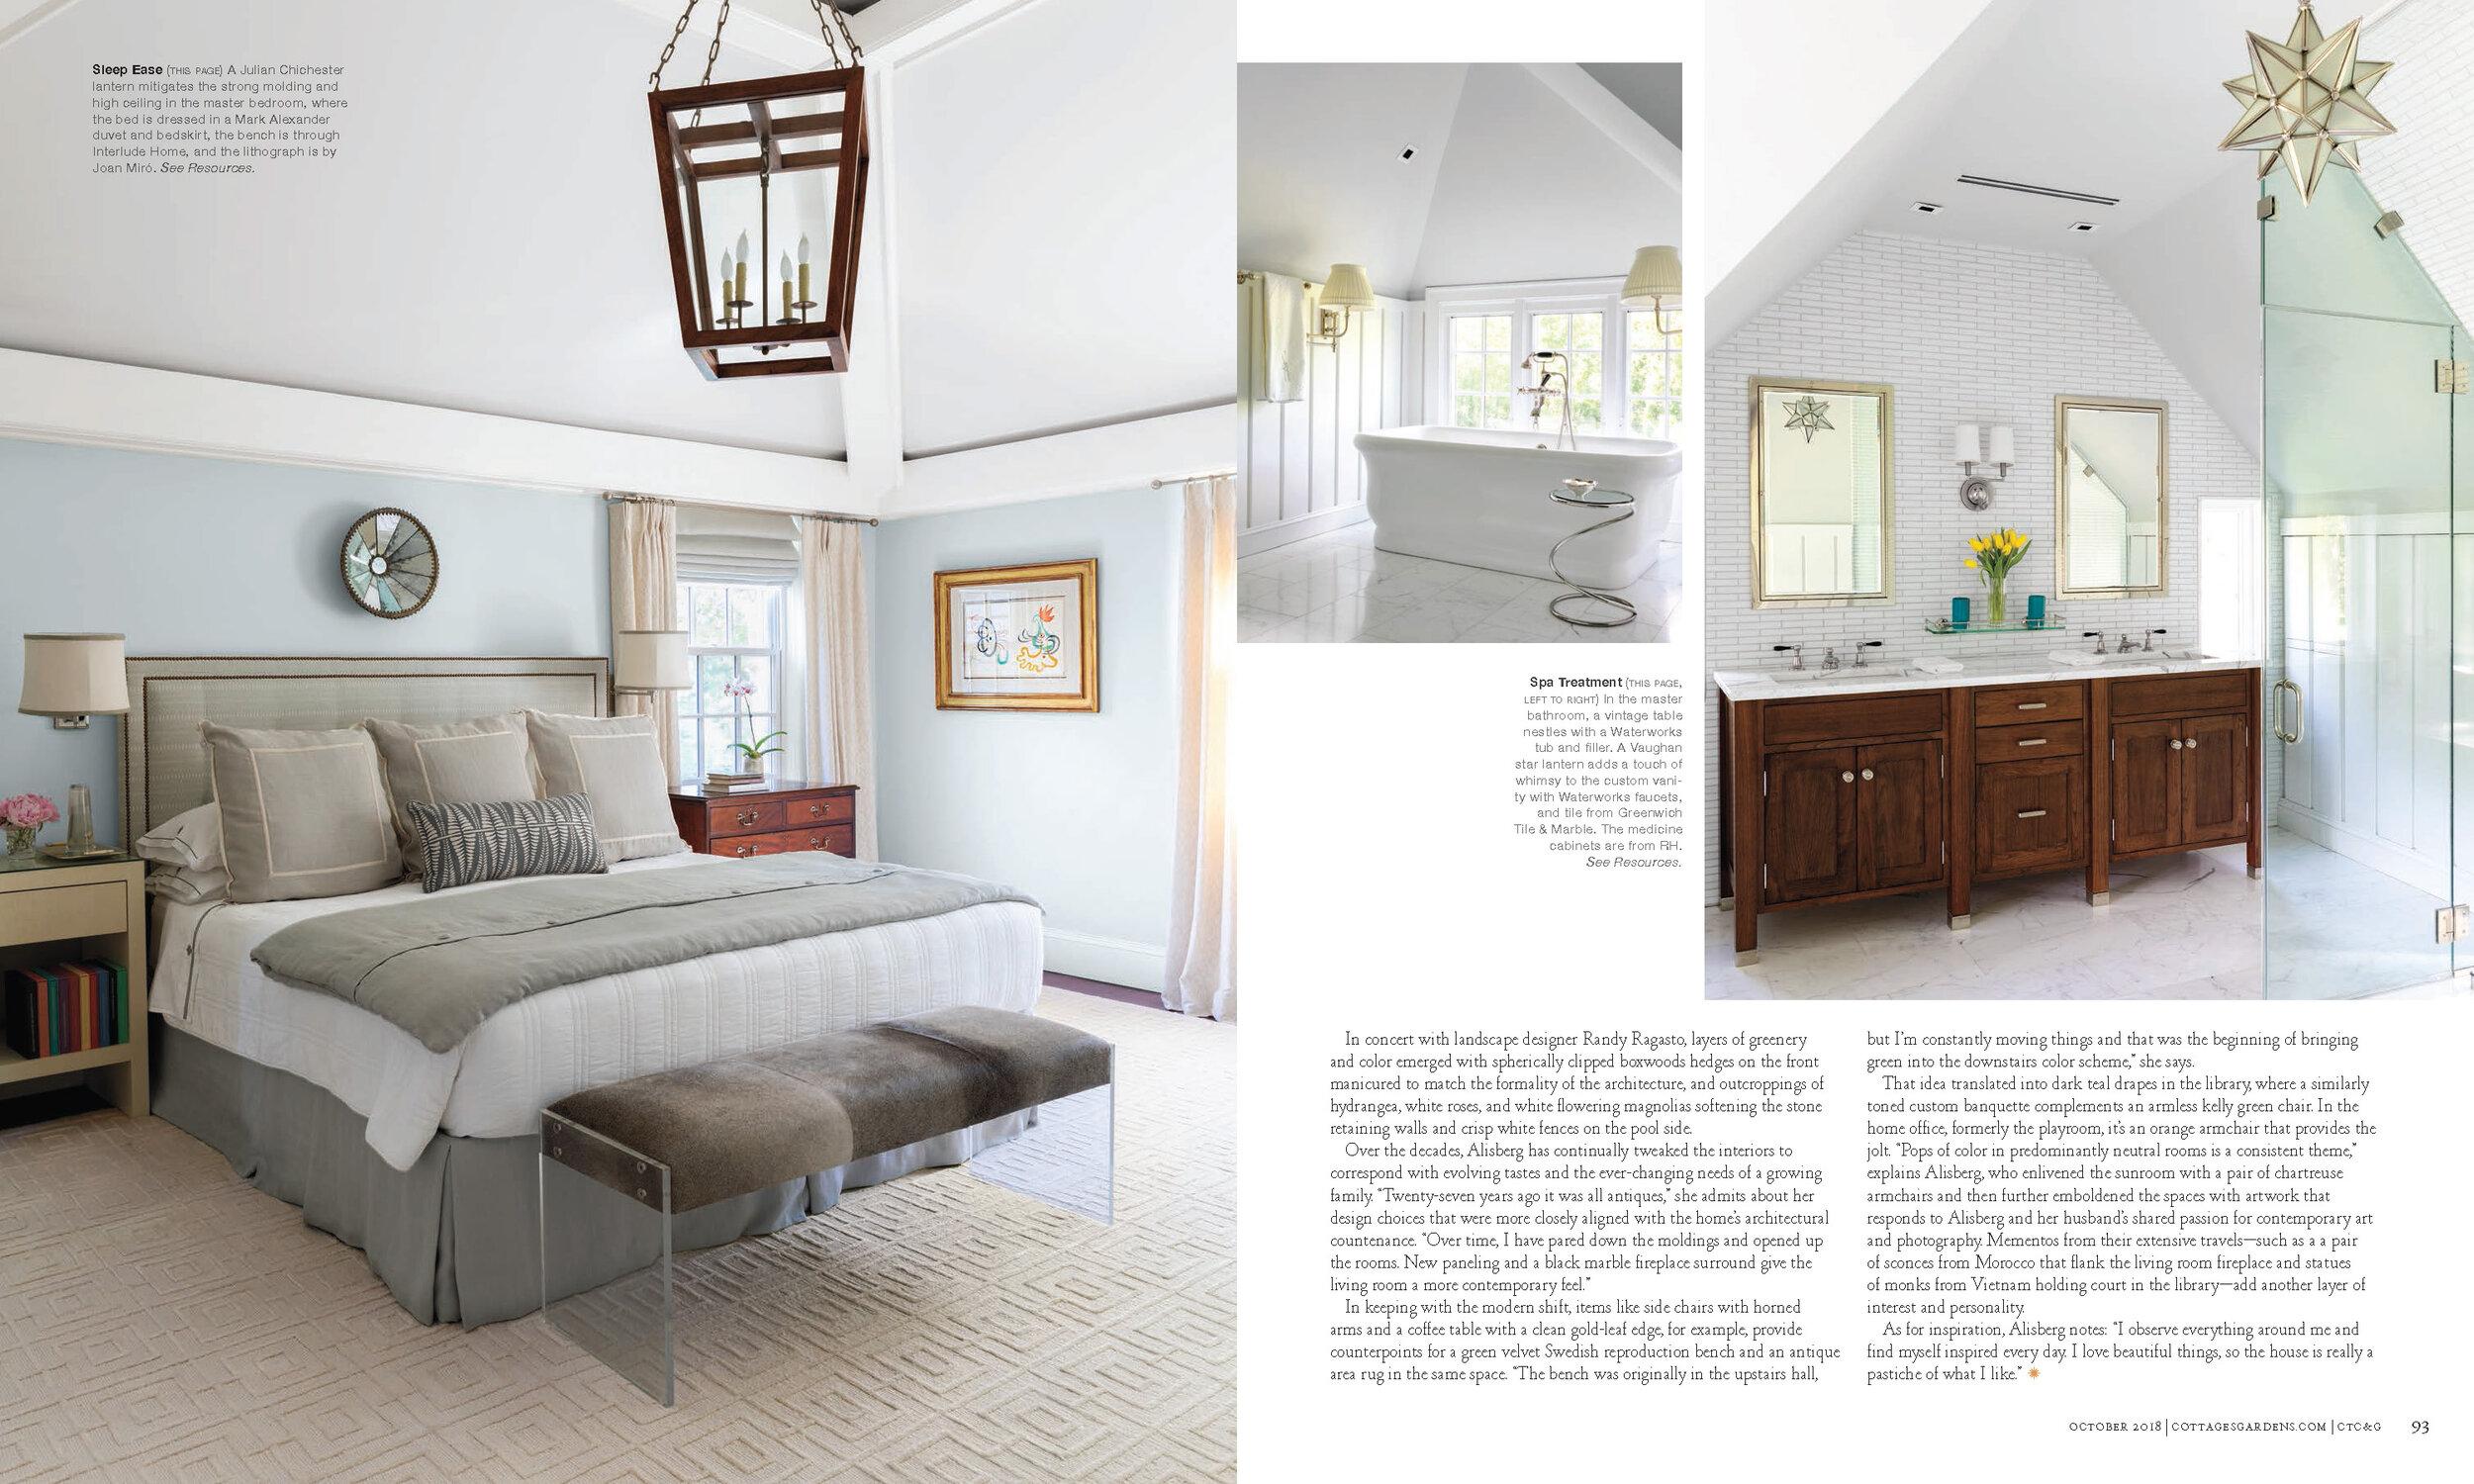 CTC&G A Rich Pastiche-Susan Alisberg 1018_Page_6.jpg